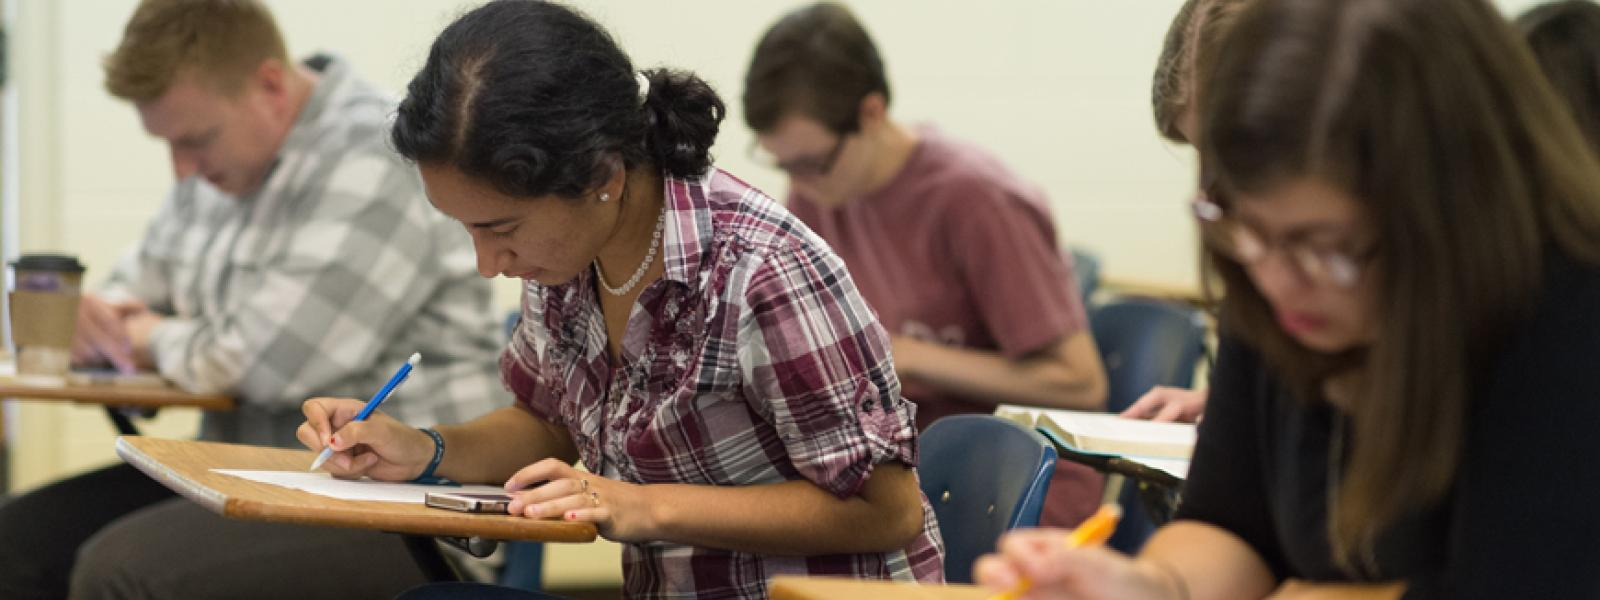 CIU undergraduate students in the classroom.